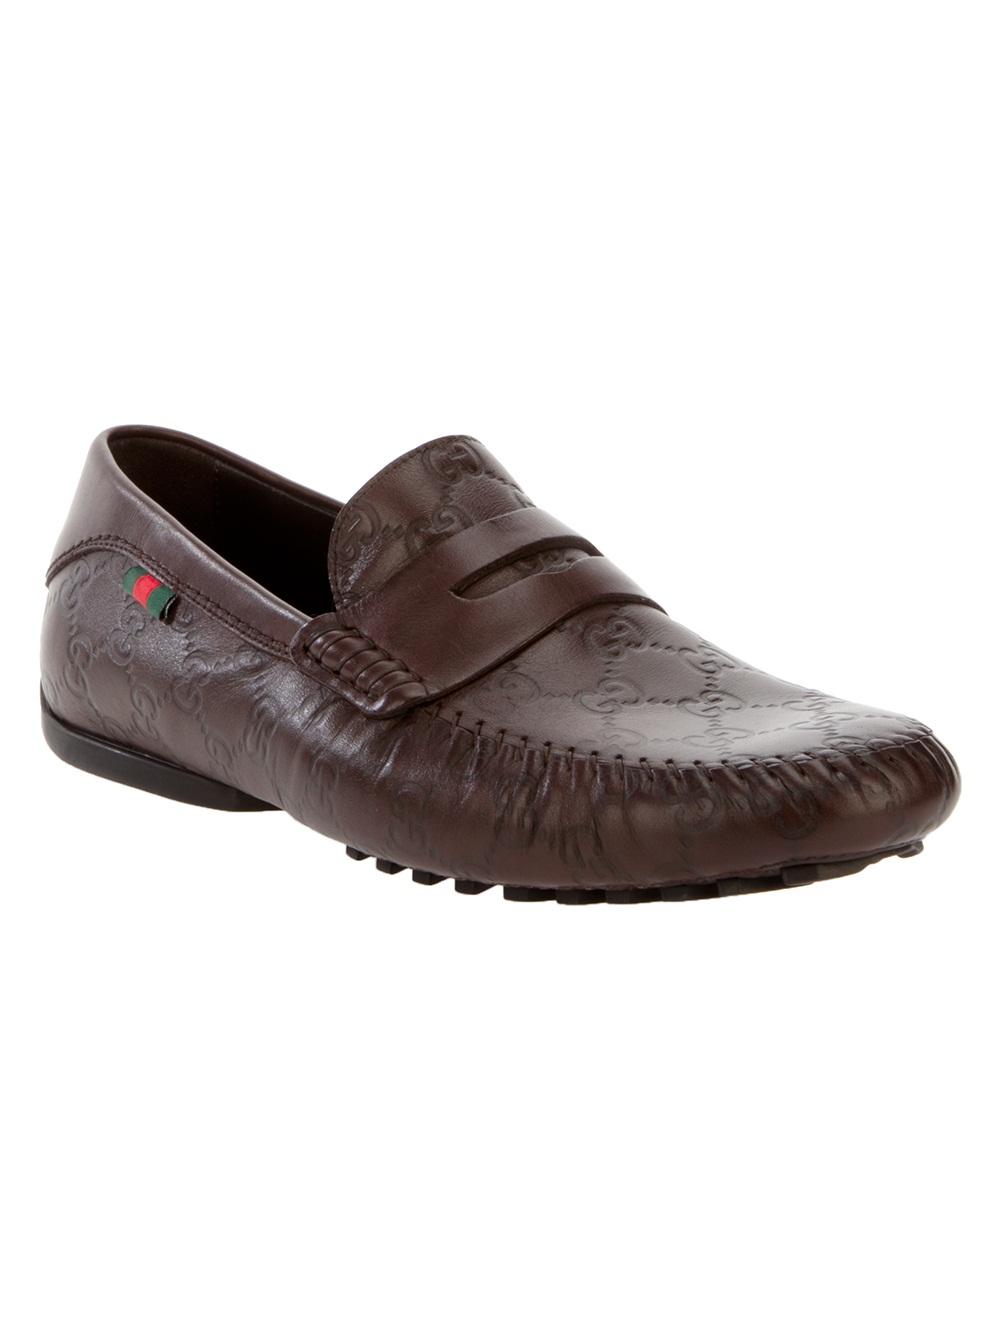 Gucci Monogram Loafer in Brown for Men | Lyst